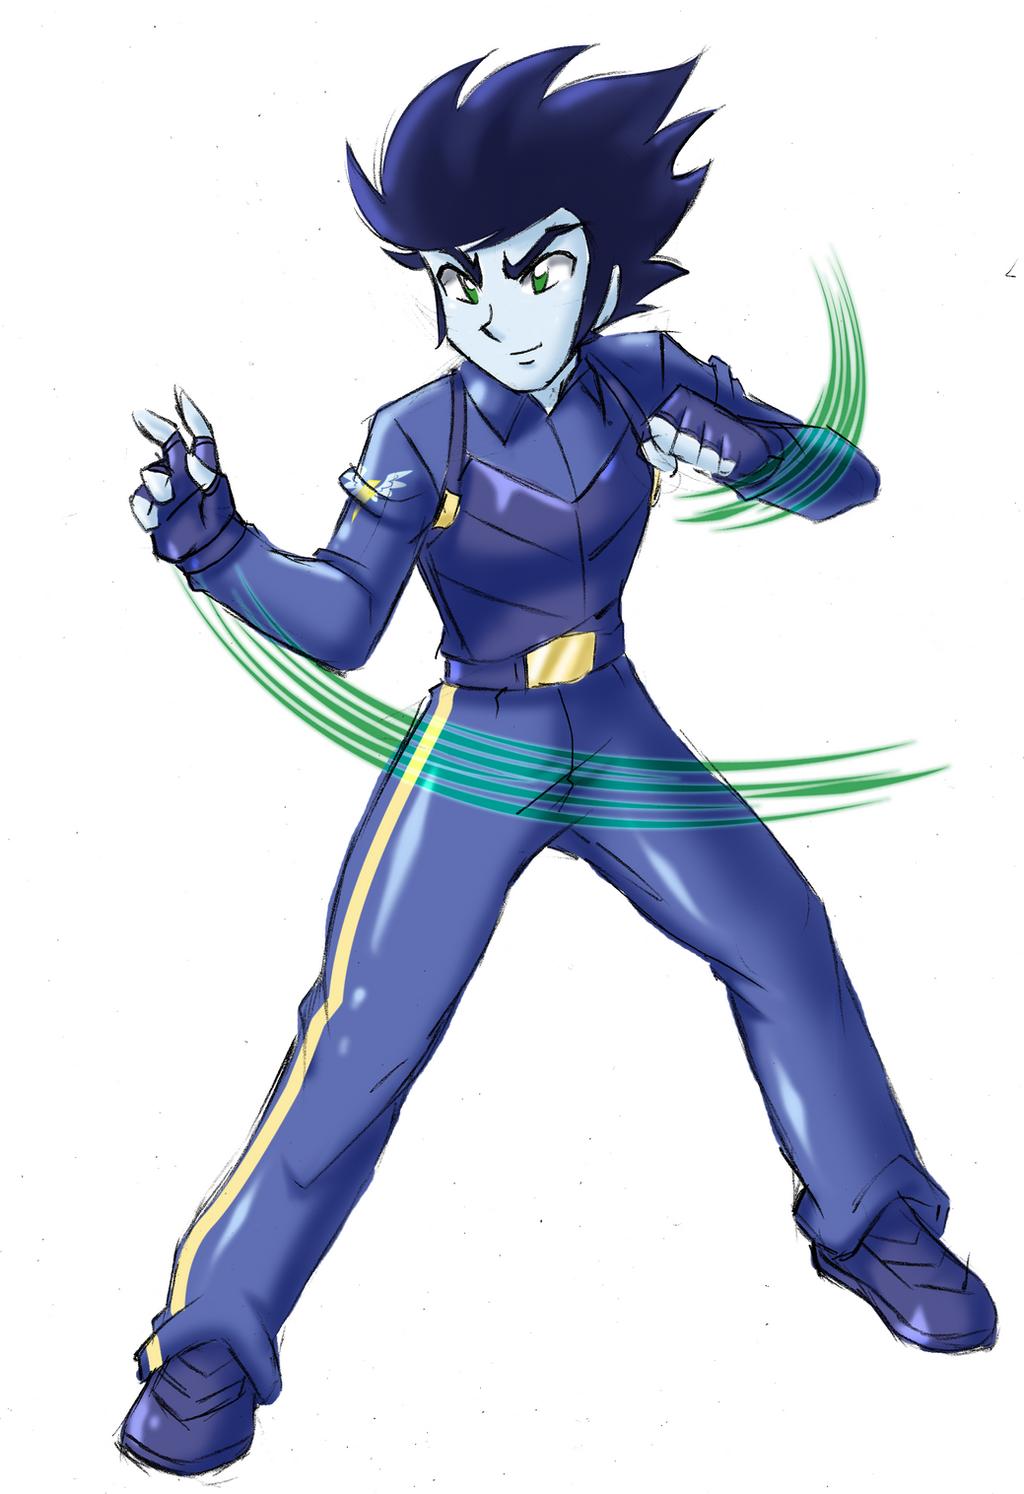 Soarin's Special Costume - Ace Pilot by RJ-Streak